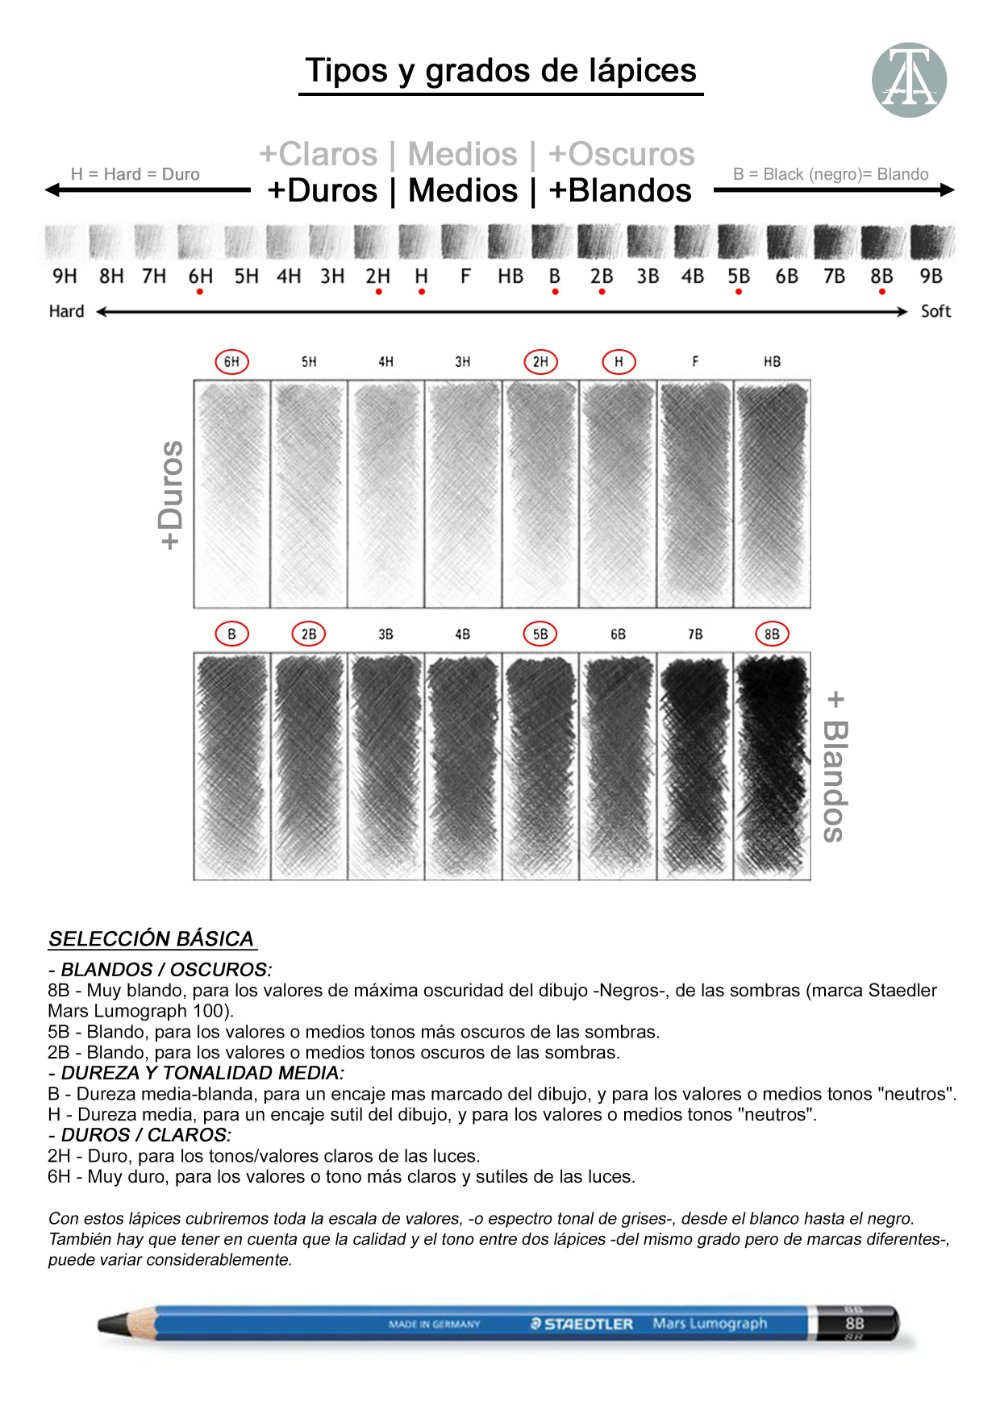 Tipos De Lapices Para Dibujar Buscar Con Google Lapices Para Dibujar Lapices De Dibujo Herramientas De Dibujo